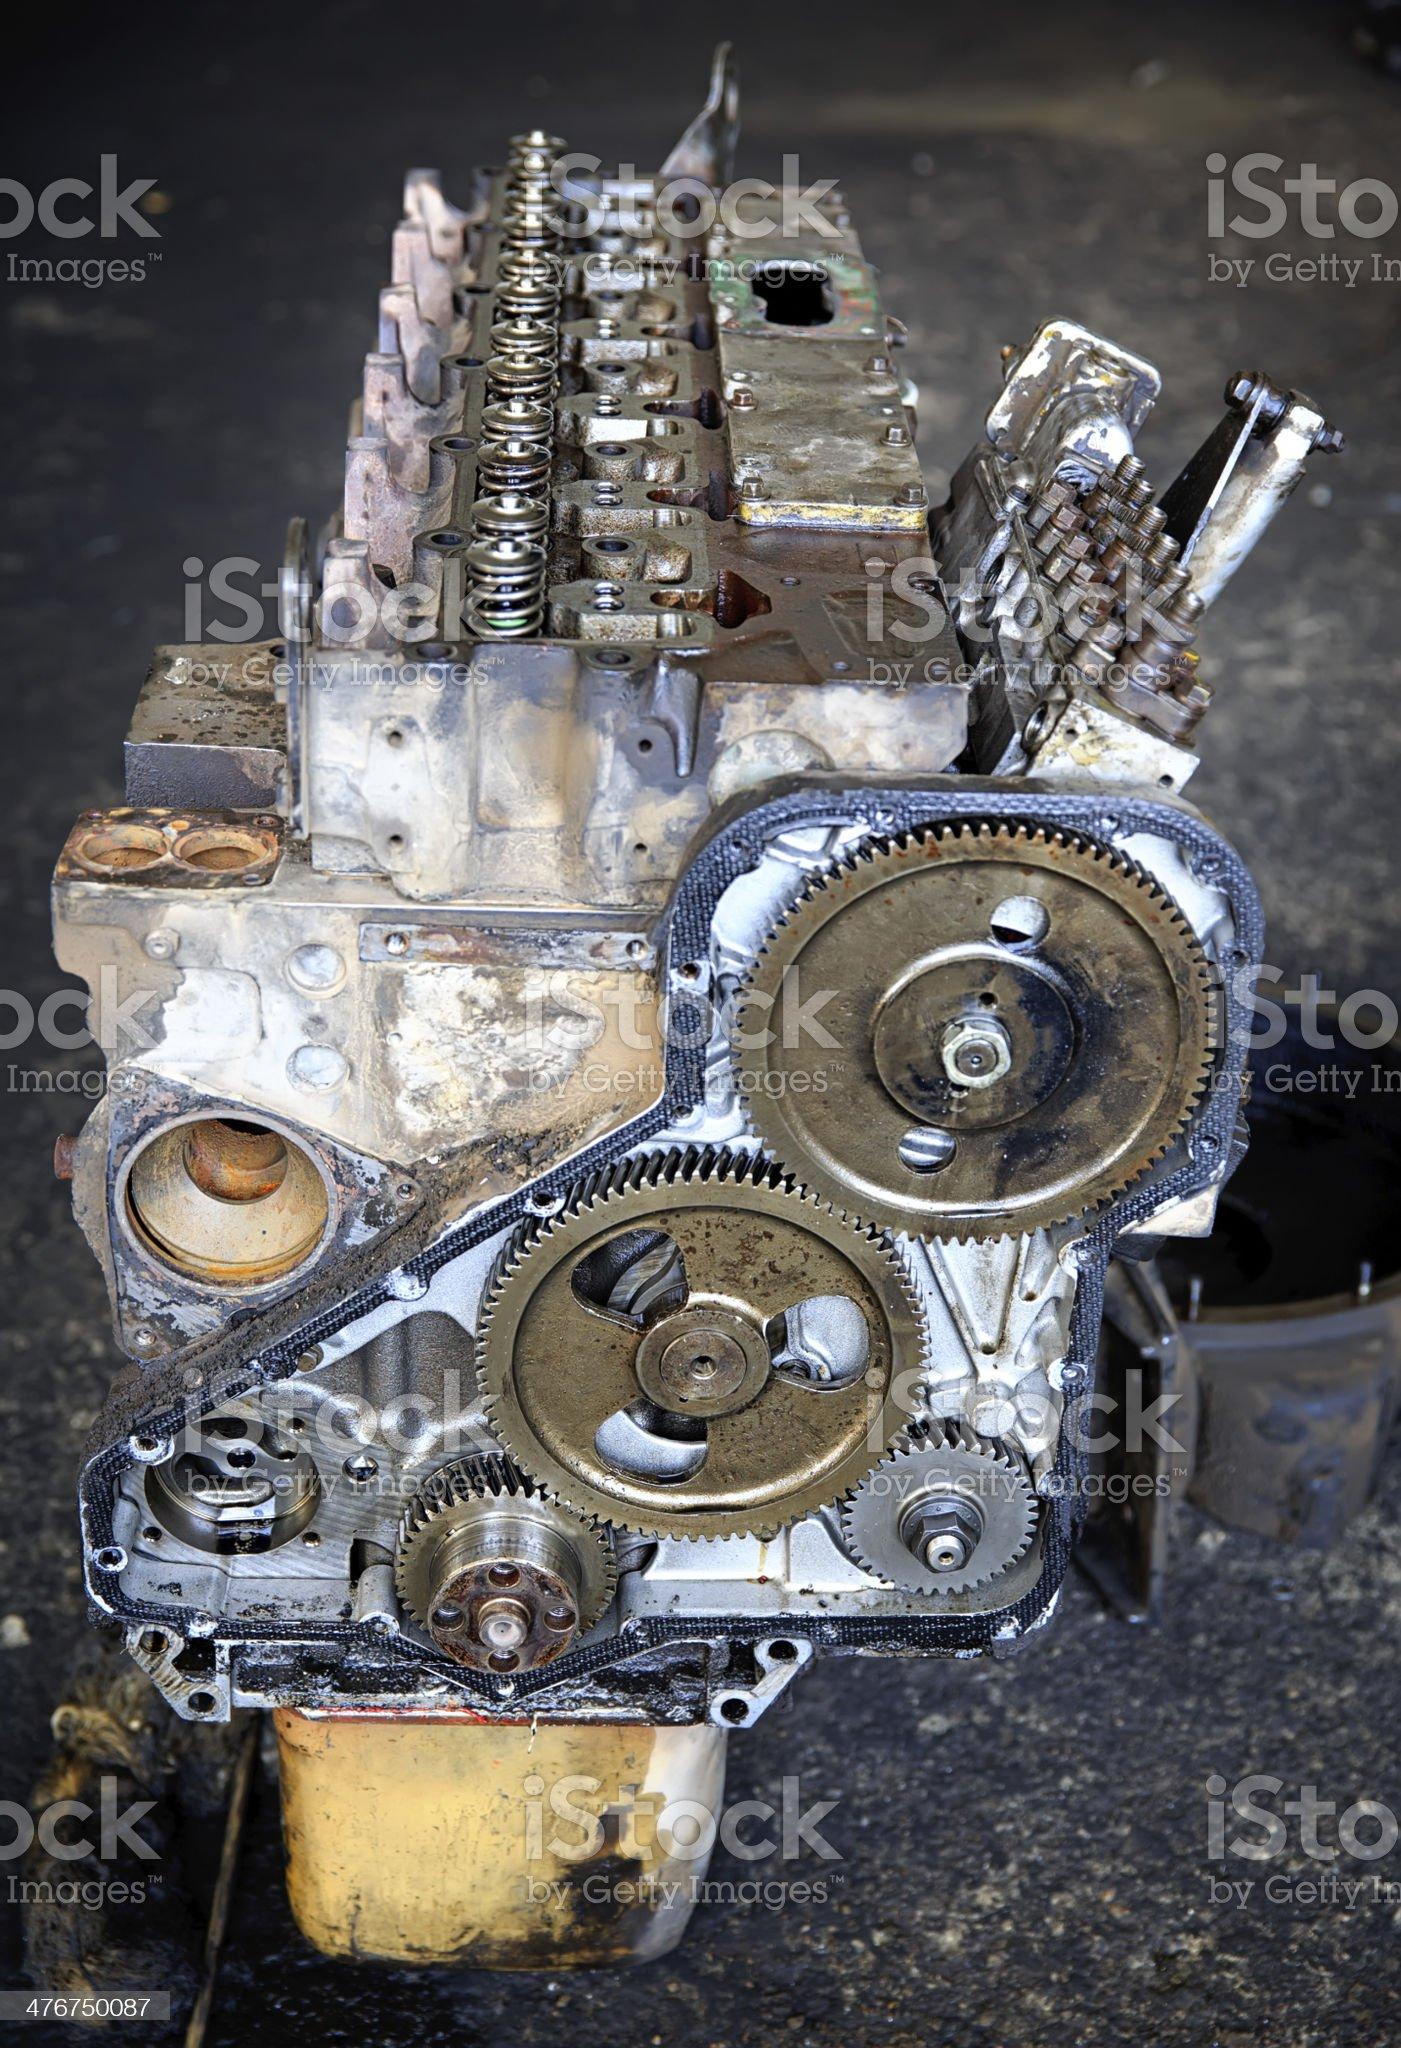 Heavy truck engine royalty-free stock photo